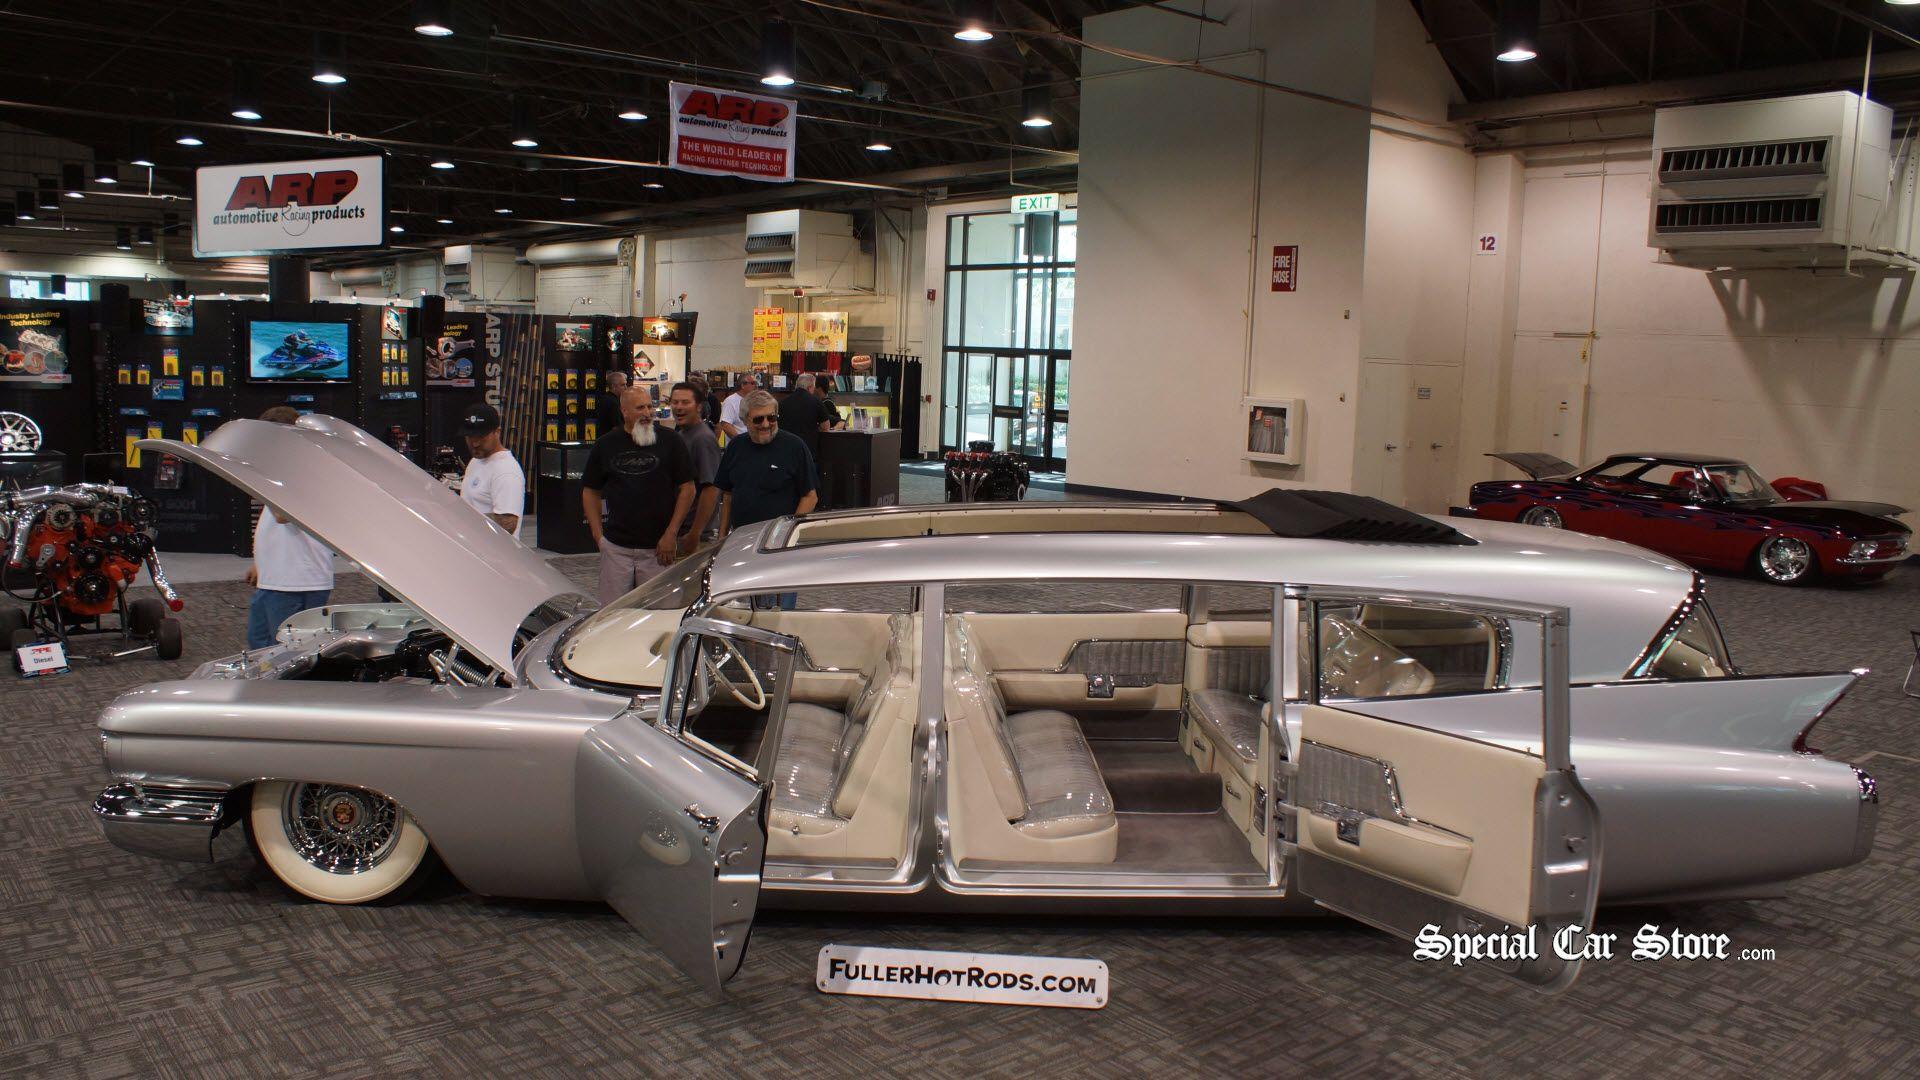 Thundertaker 1960 Cadillac Superior Coachworks Hearse HOT ROD